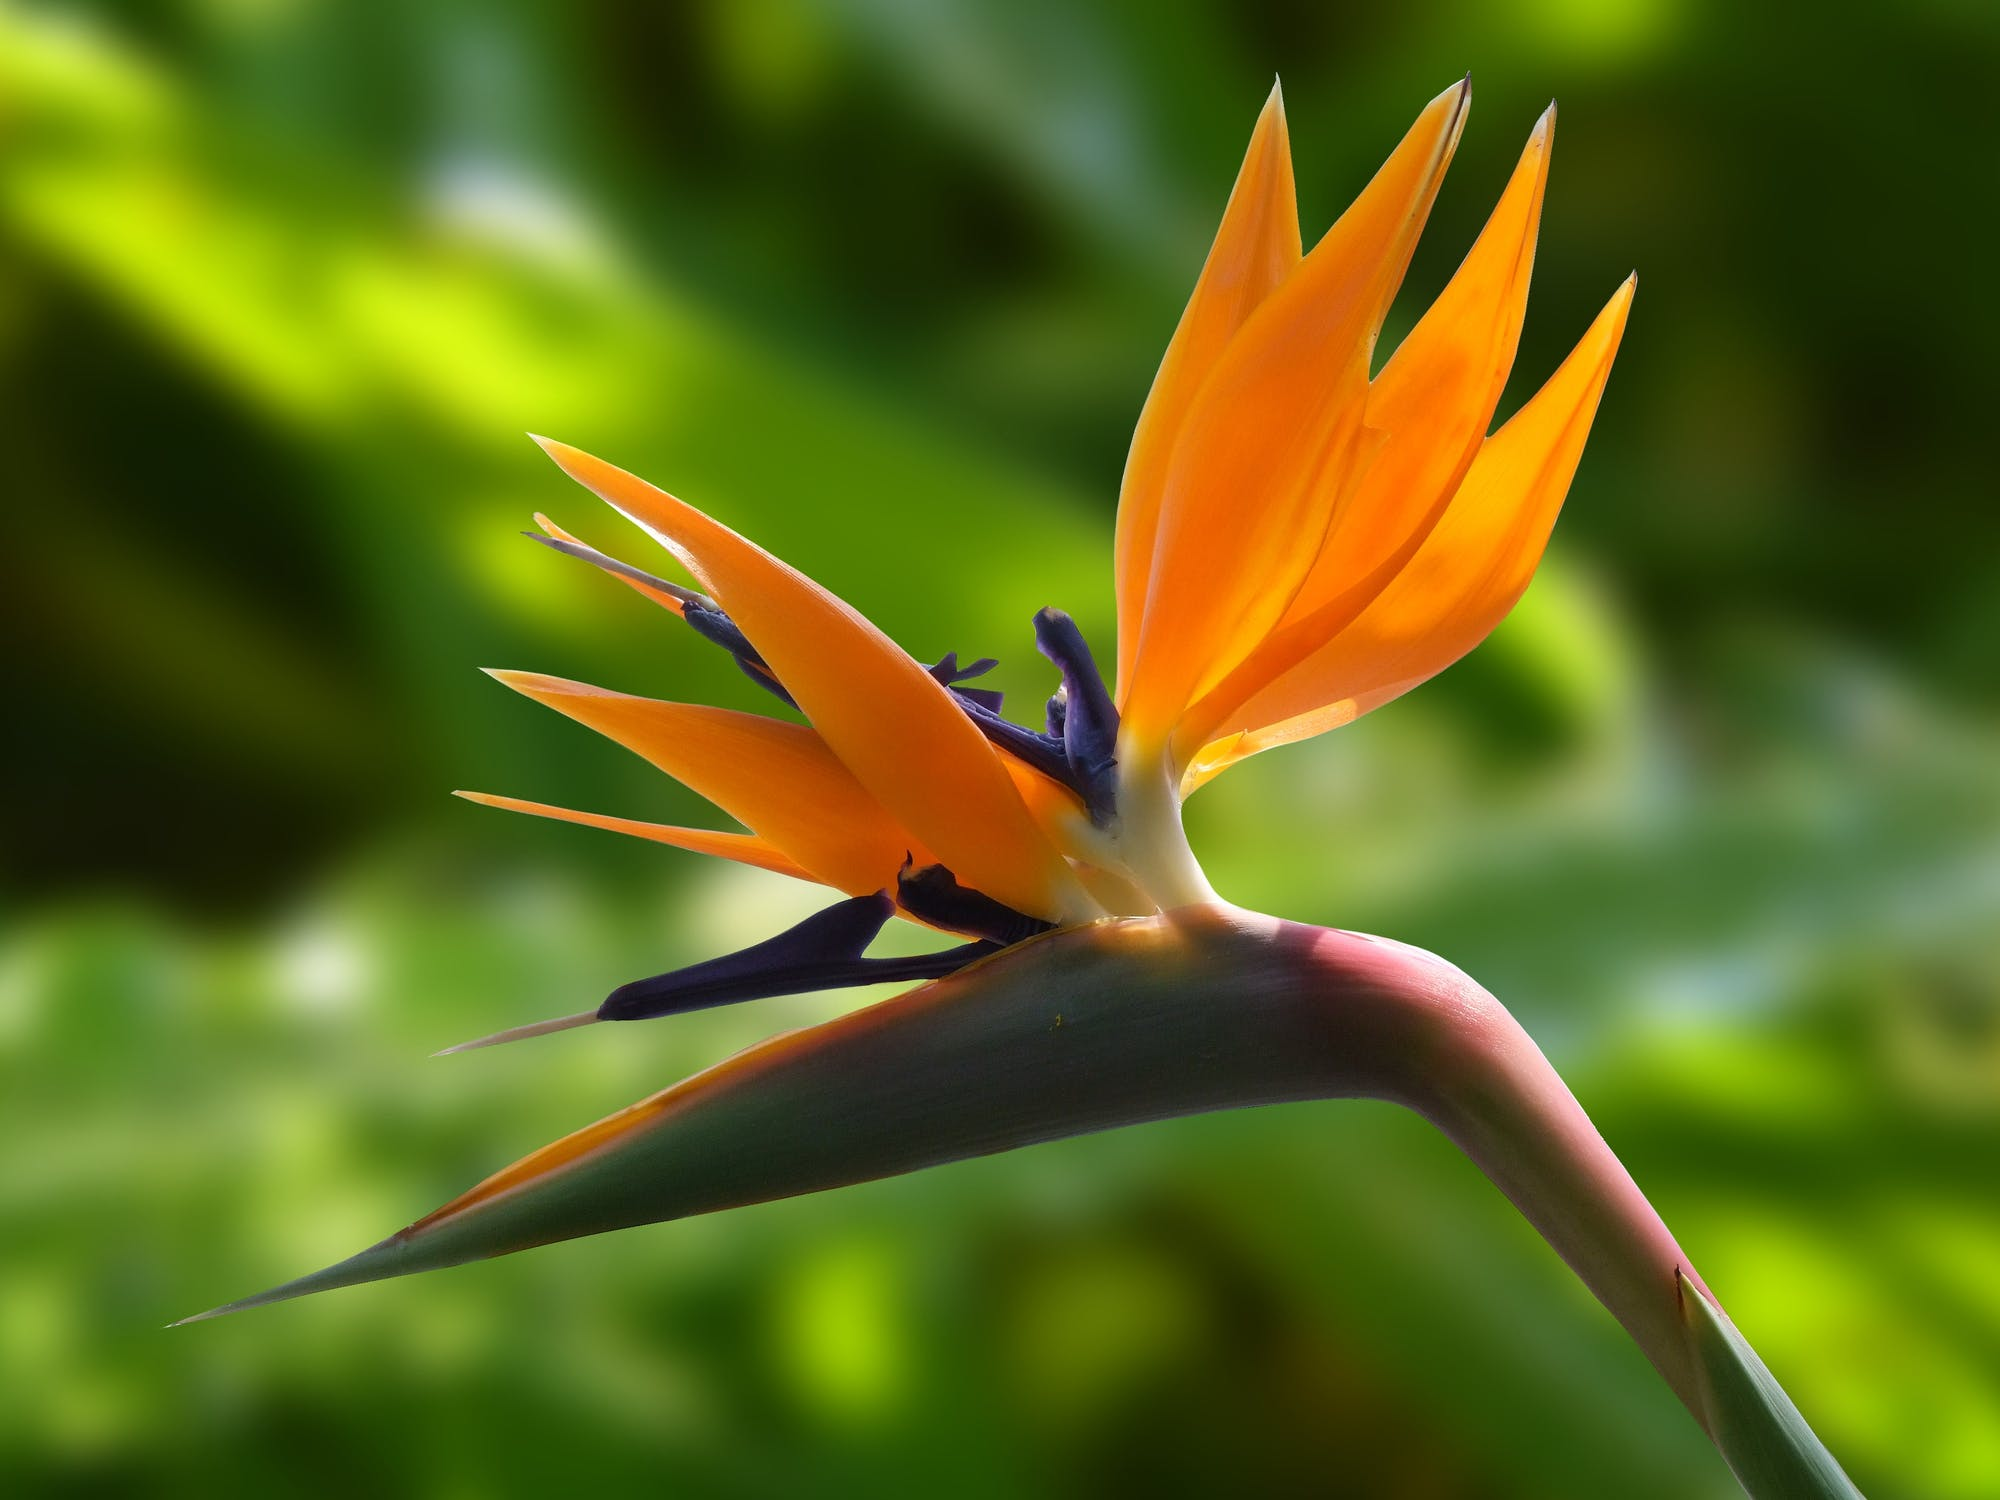 The Strelitzia Flower